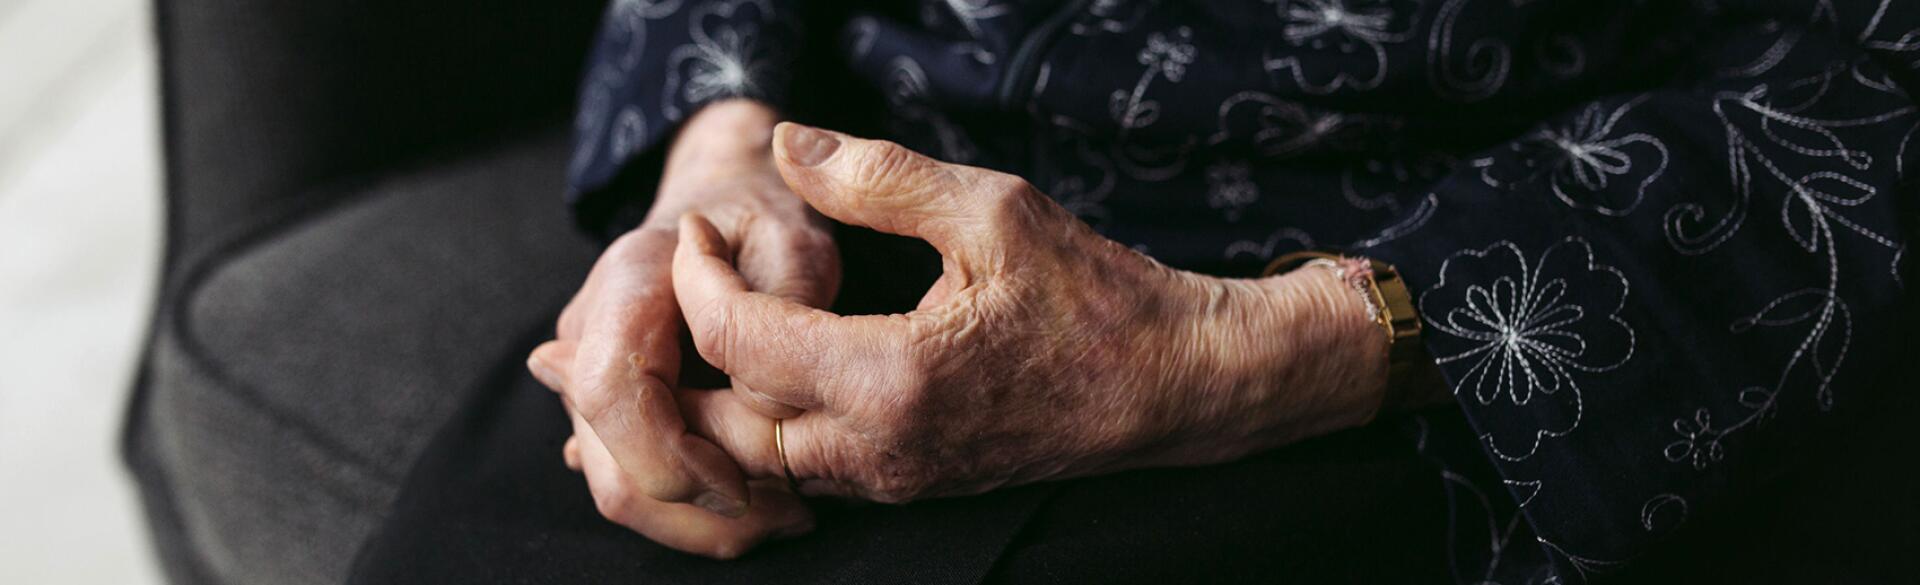 closeup of elderly woman's hands